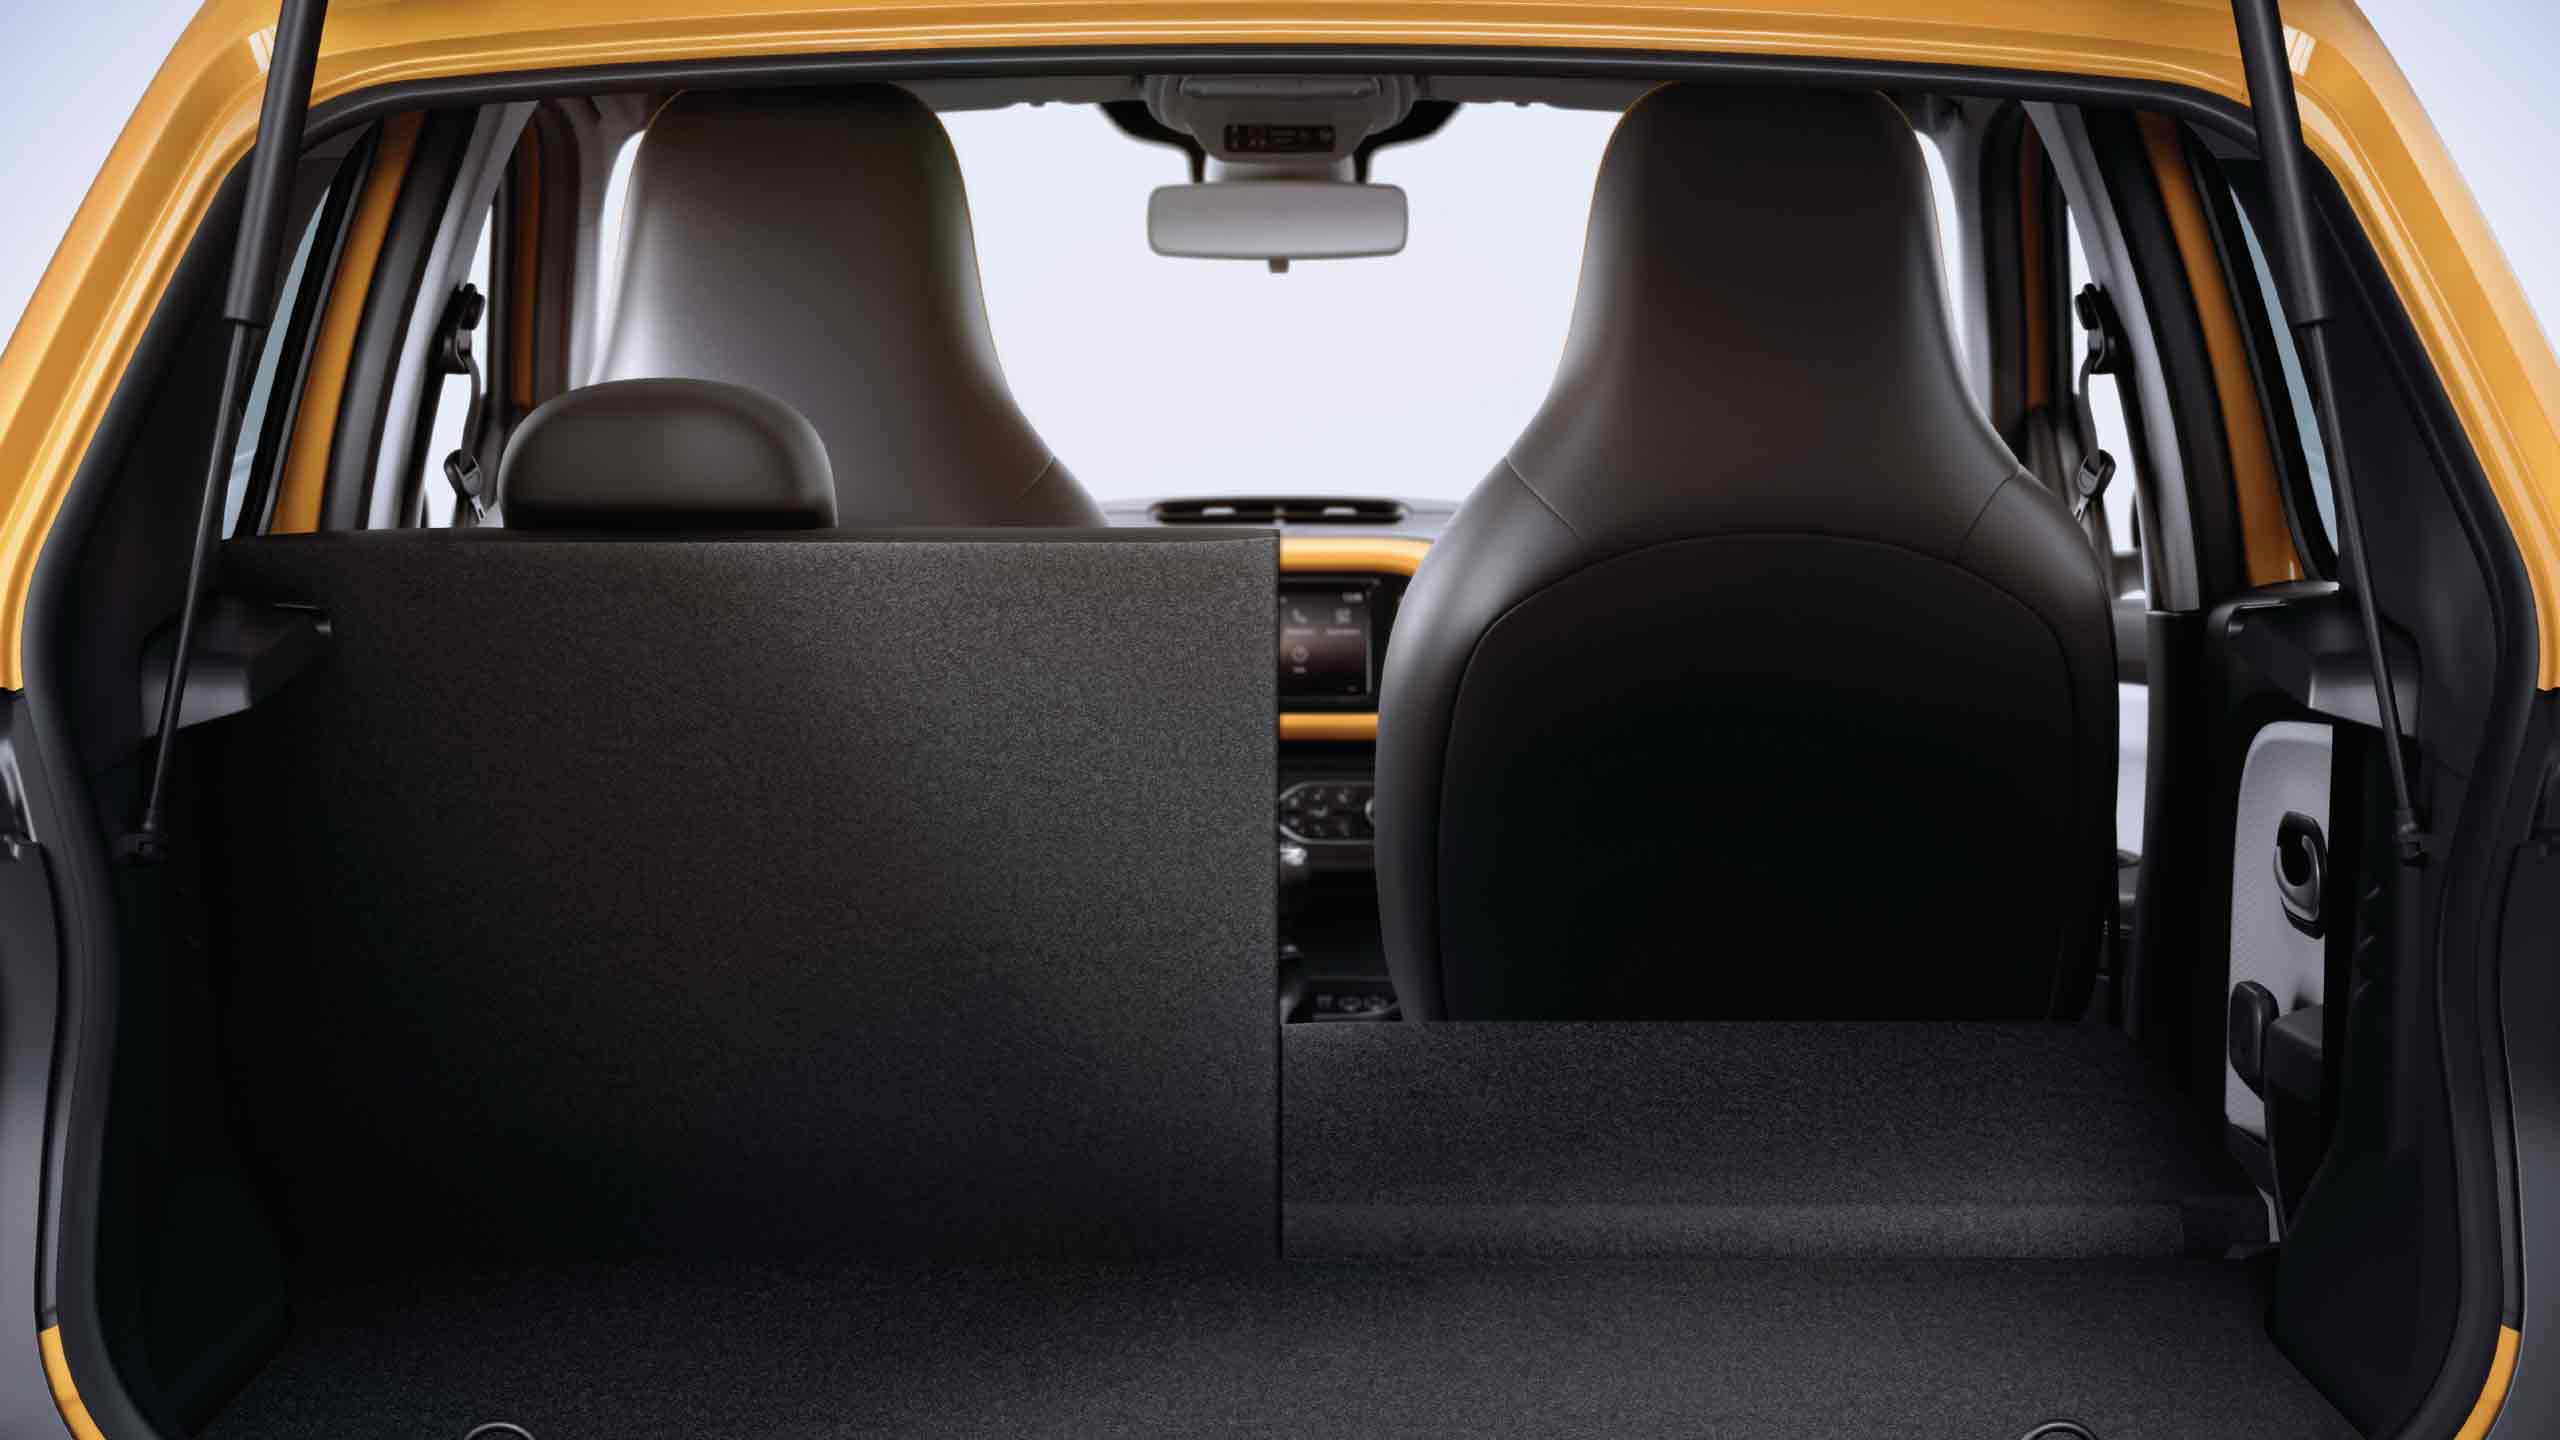 Renault Twingo Autozentrum P&A-Preckel